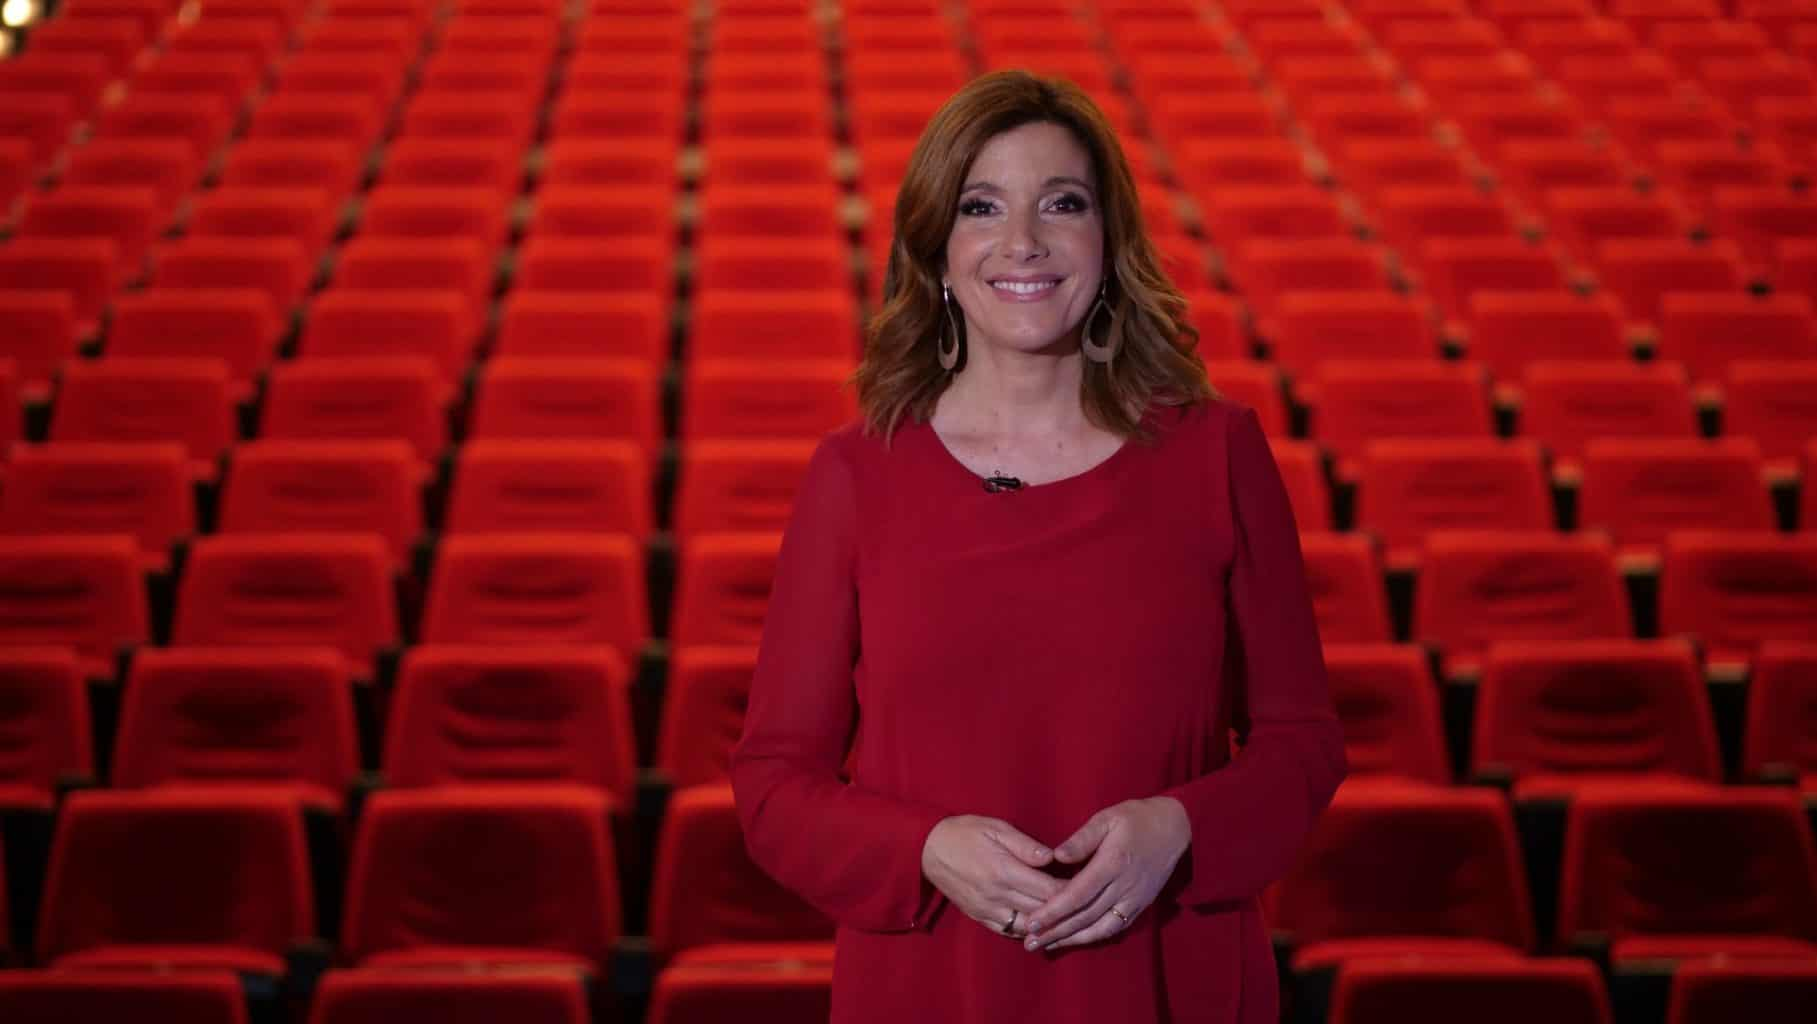 GrowthCLUB Lisboa: Venha planear o 3º trimestre de 2019  com a Carla Rocha